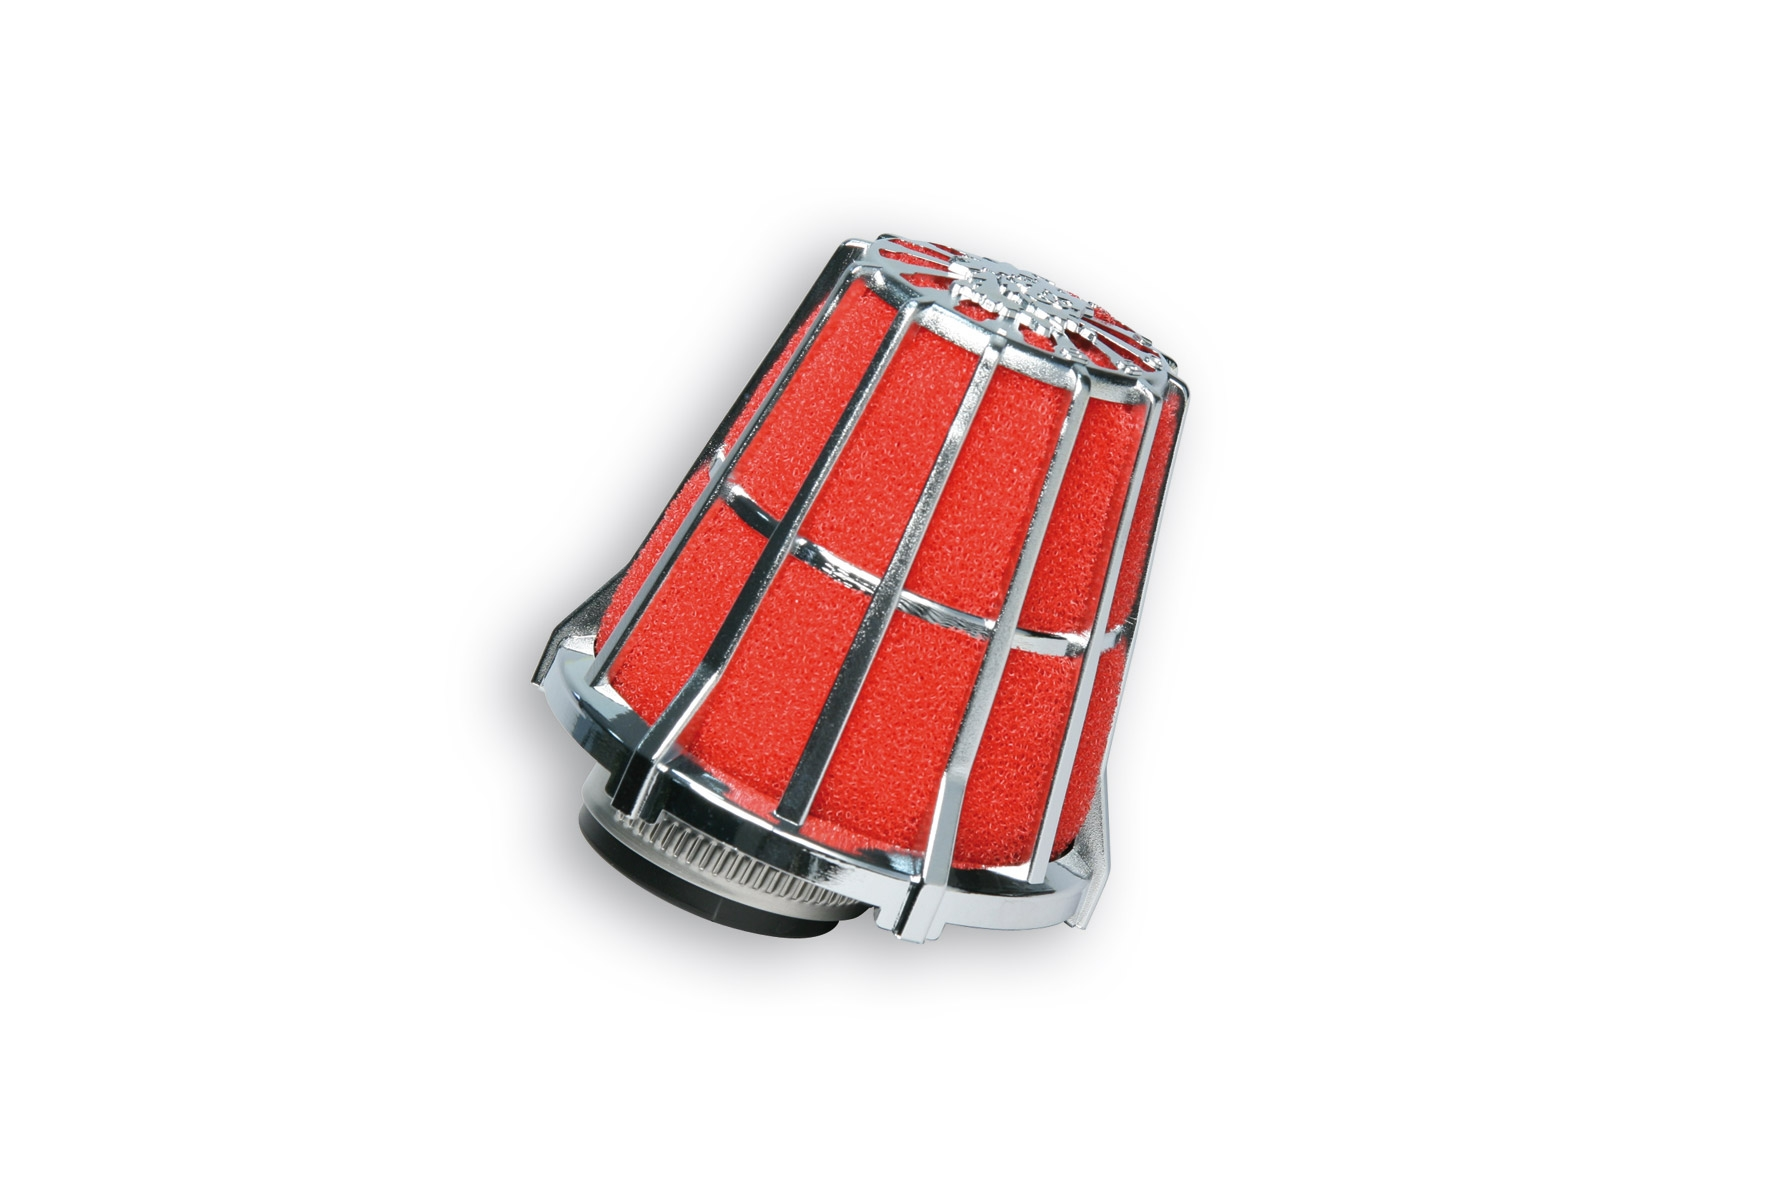 Filtre à air Malossi Red Filter E5 D.43 chromé